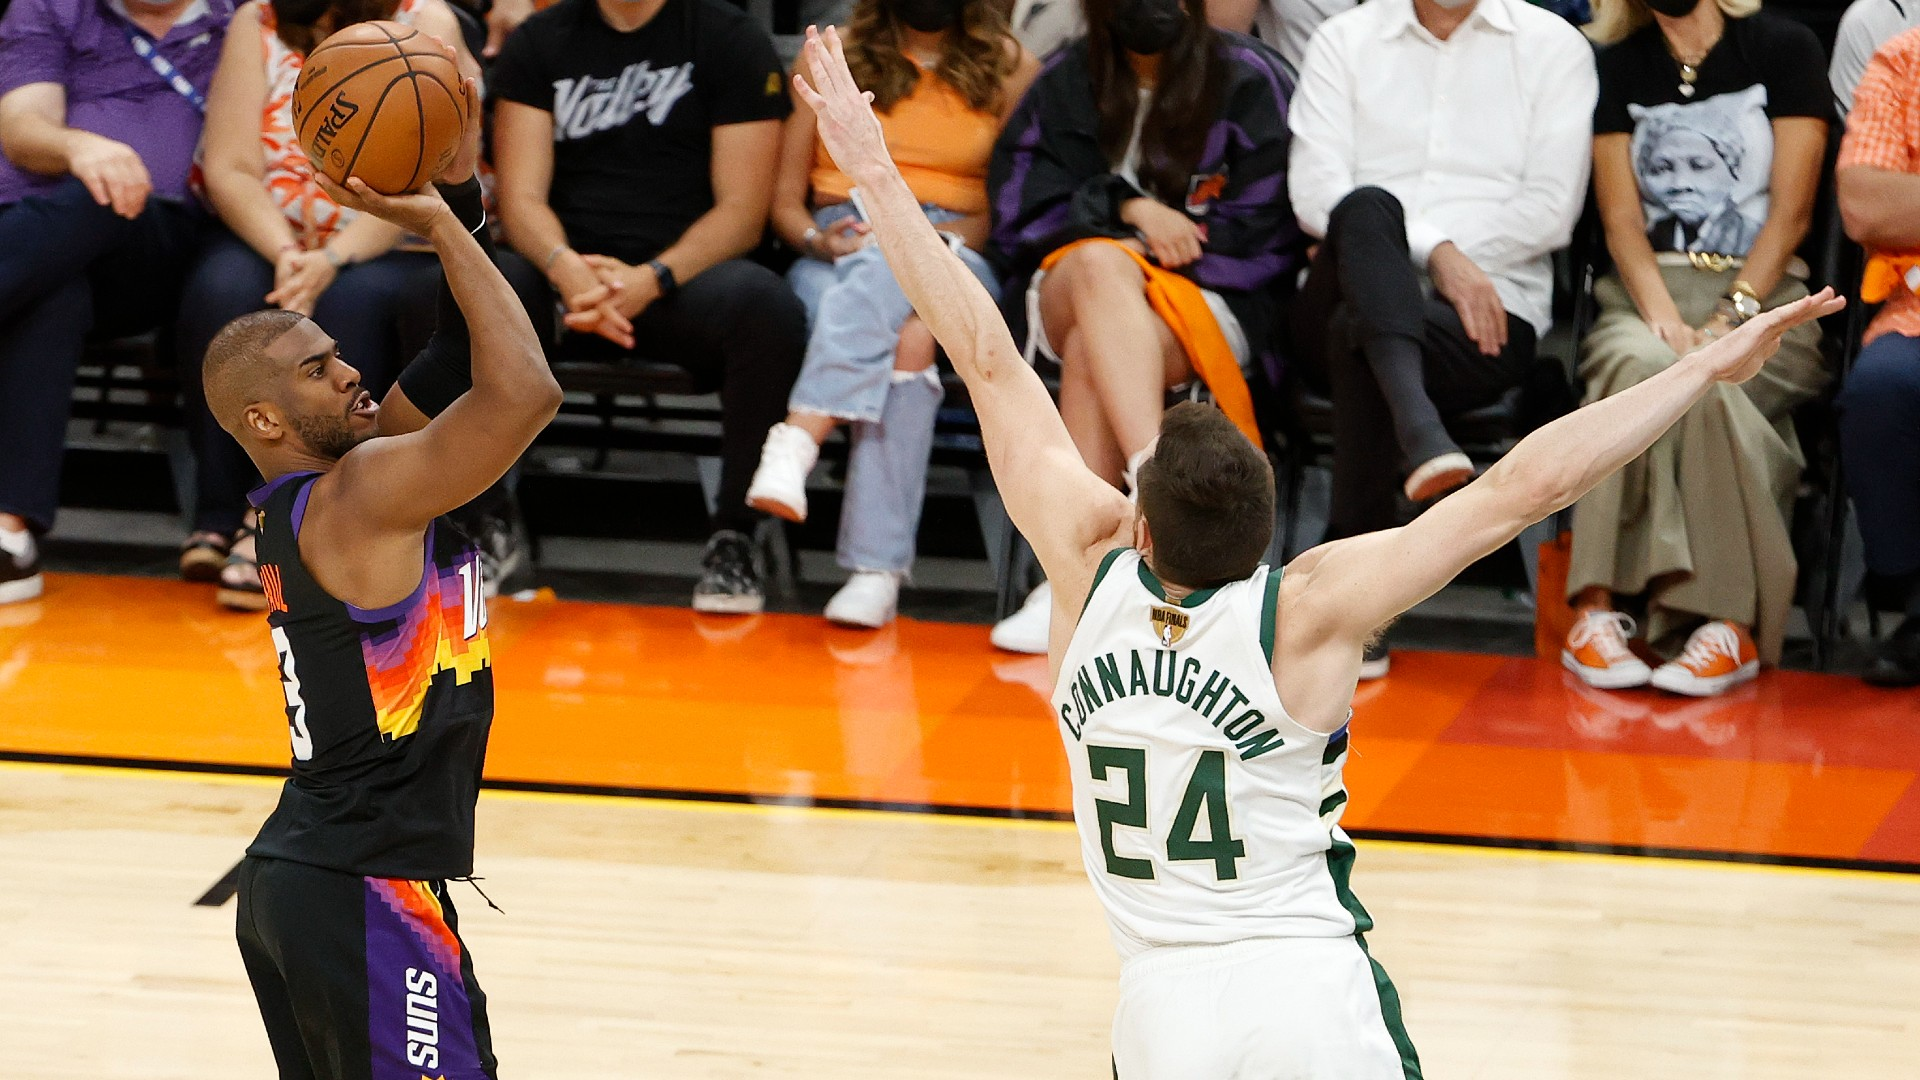 Suns vs. Bucks score, results: Milwaukee survives Devin Booker's Game 4 outburst, evens series